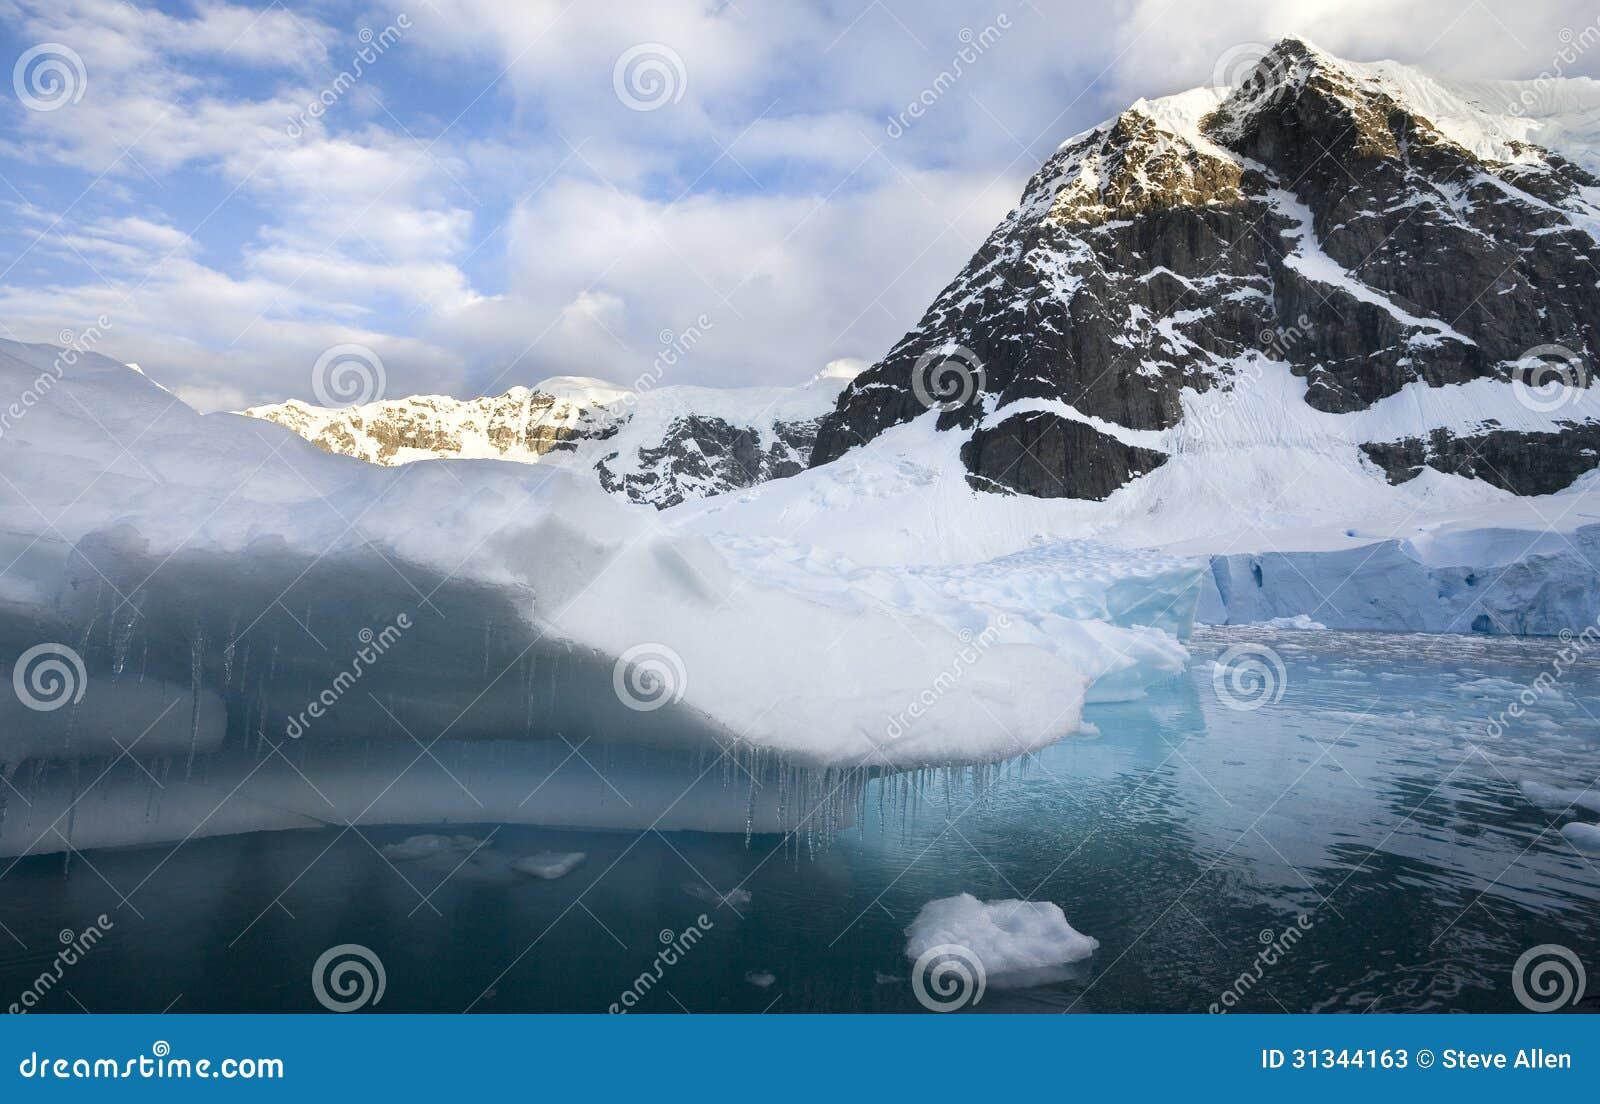 Melting Ice - Antarctica